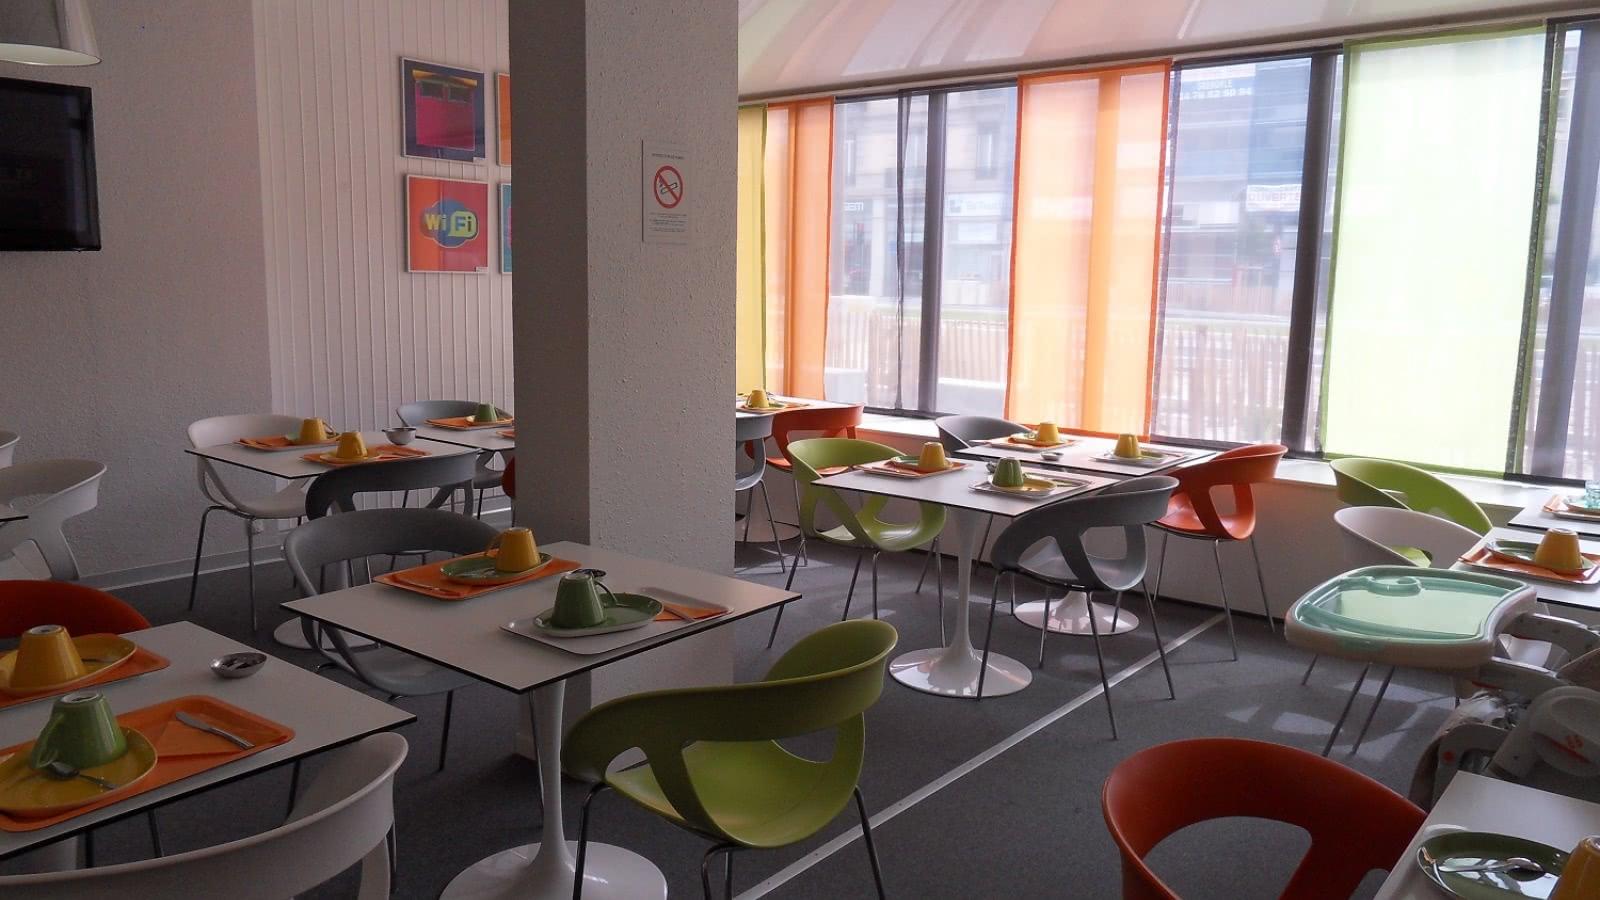 Salle de petit-déjeuner